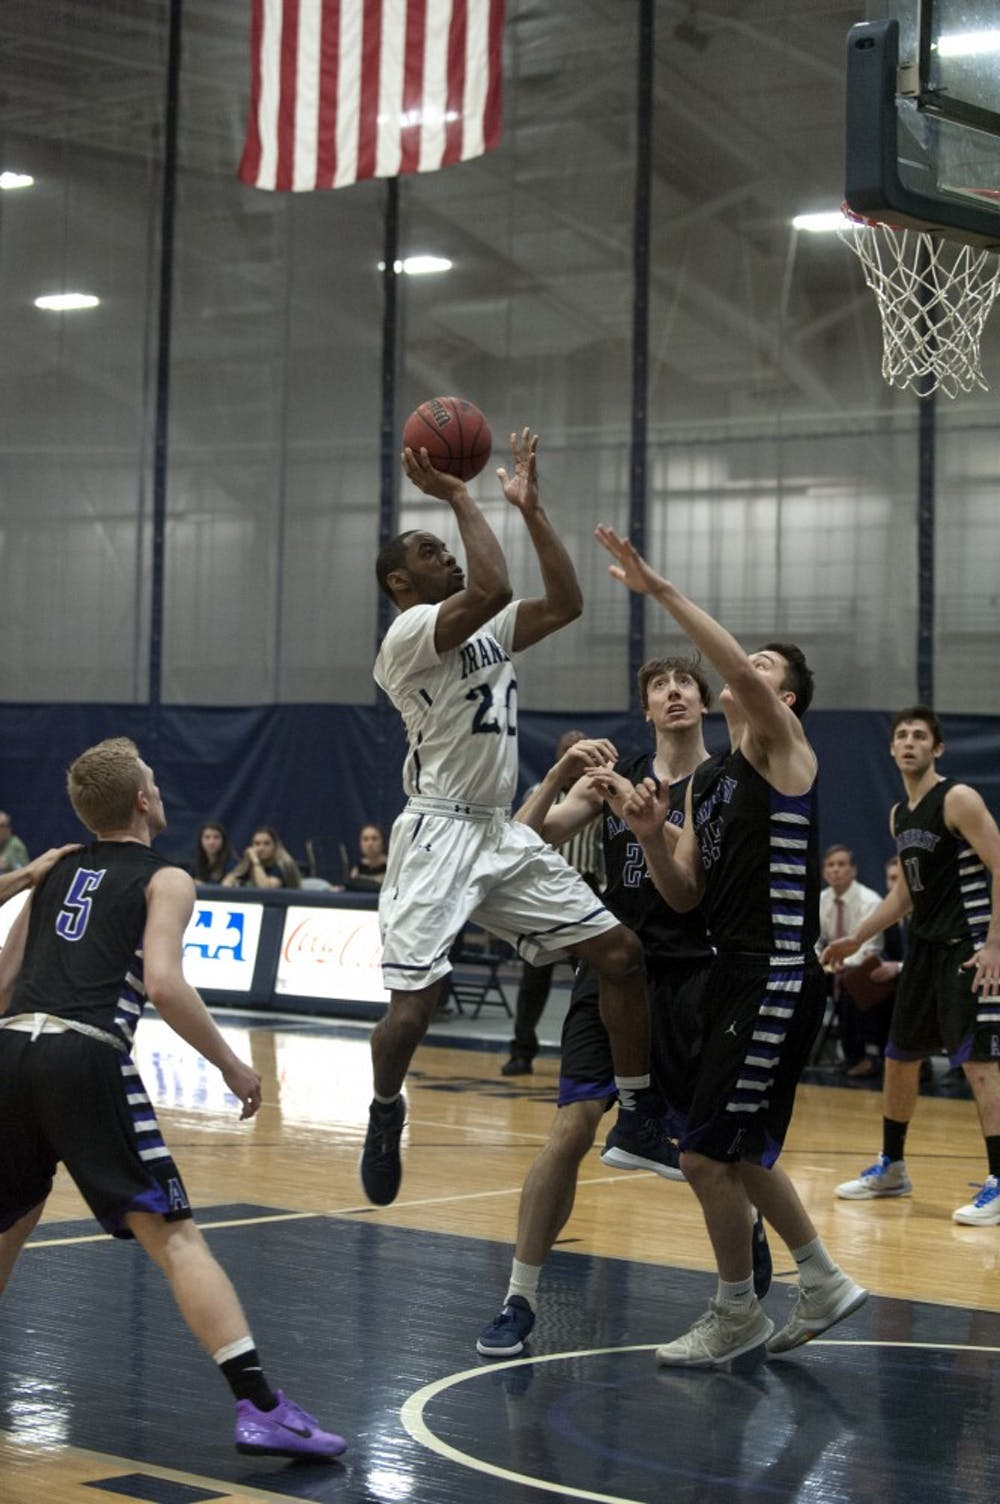 basketball-m-vs-amherst-1-8-18-ab-0016